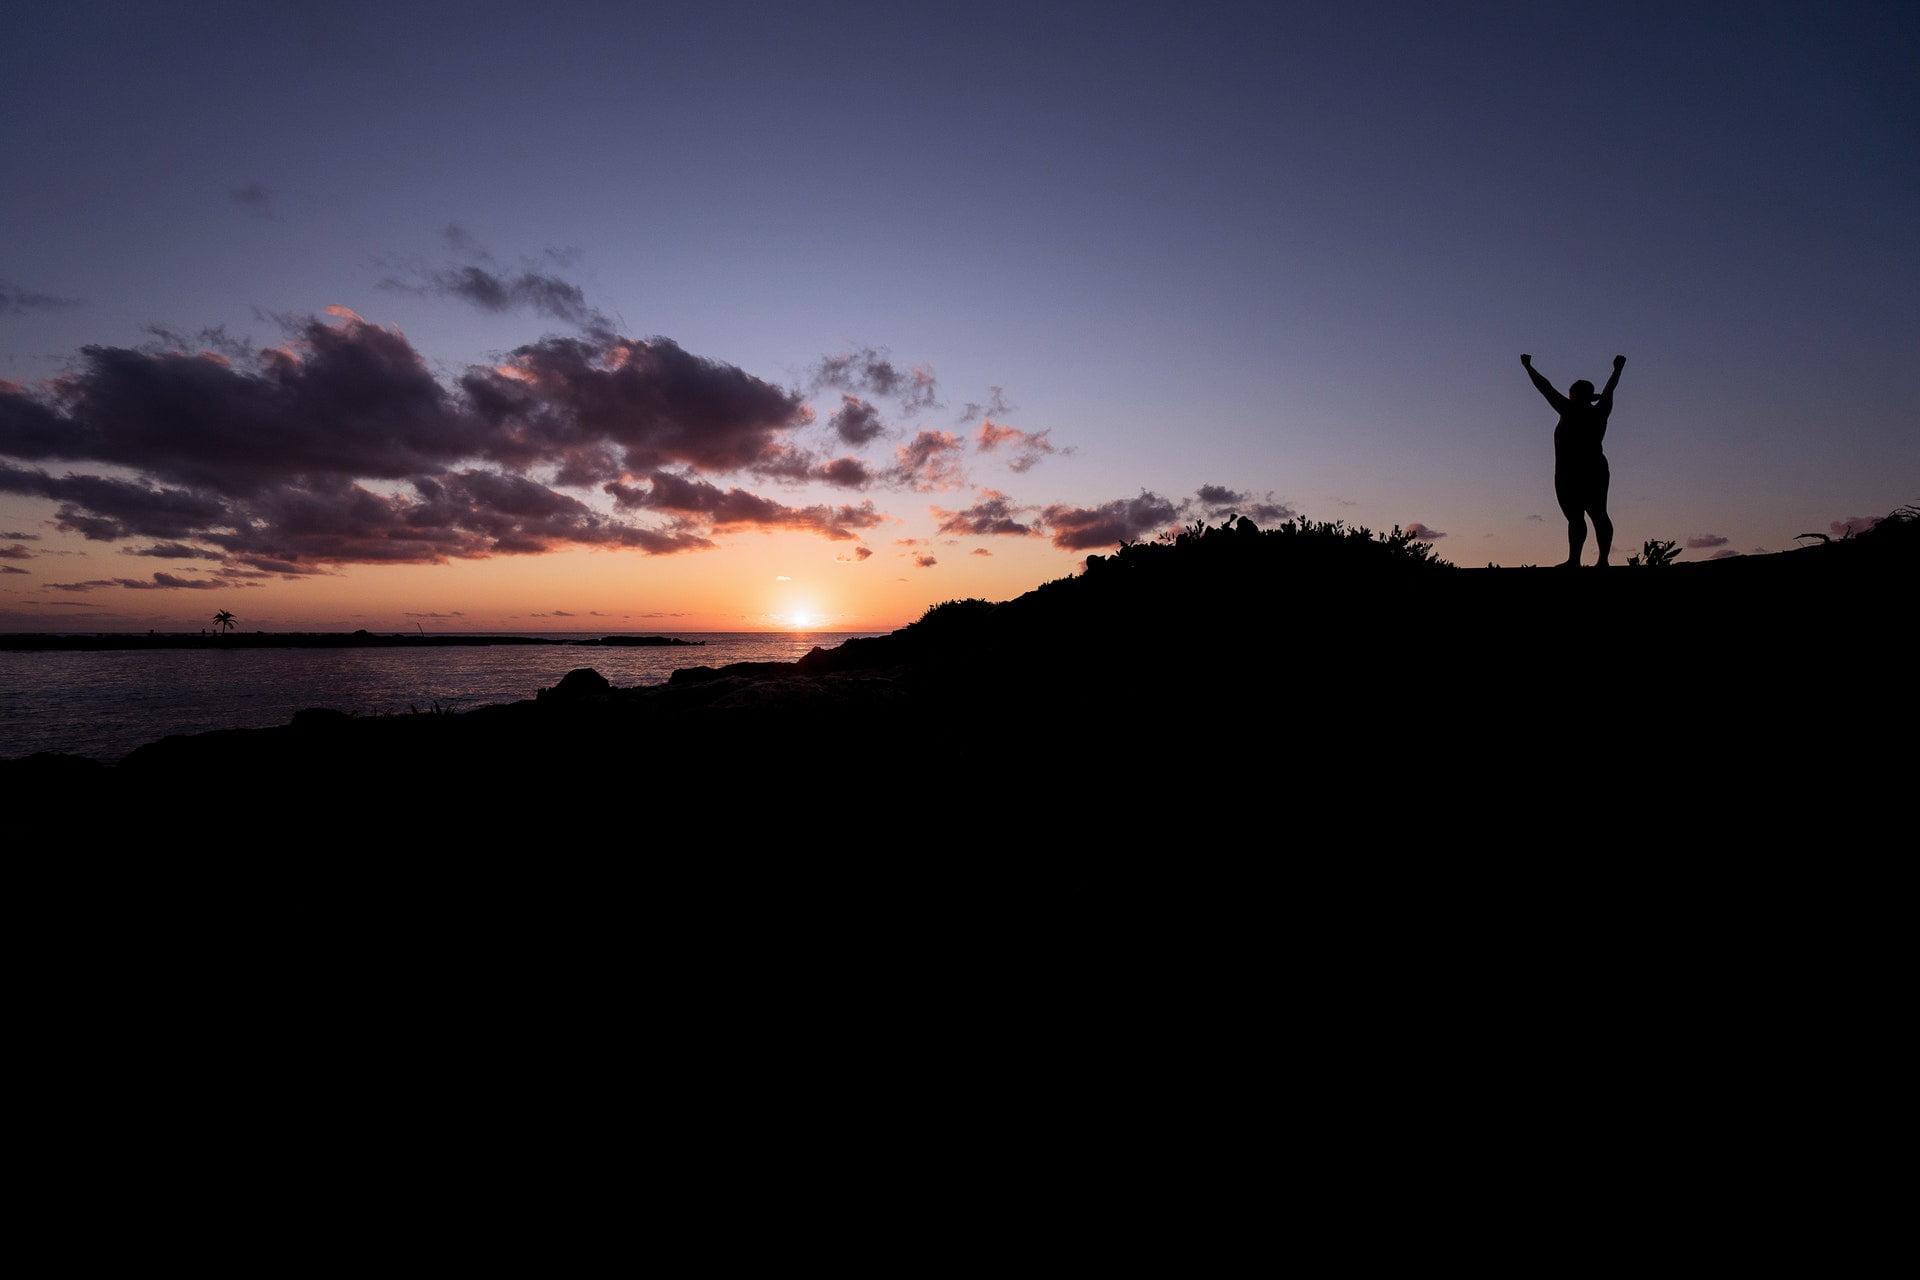 09~10月統一發票 1000+200 萬獎落淡水 light landscape sunset person winning mountain sea